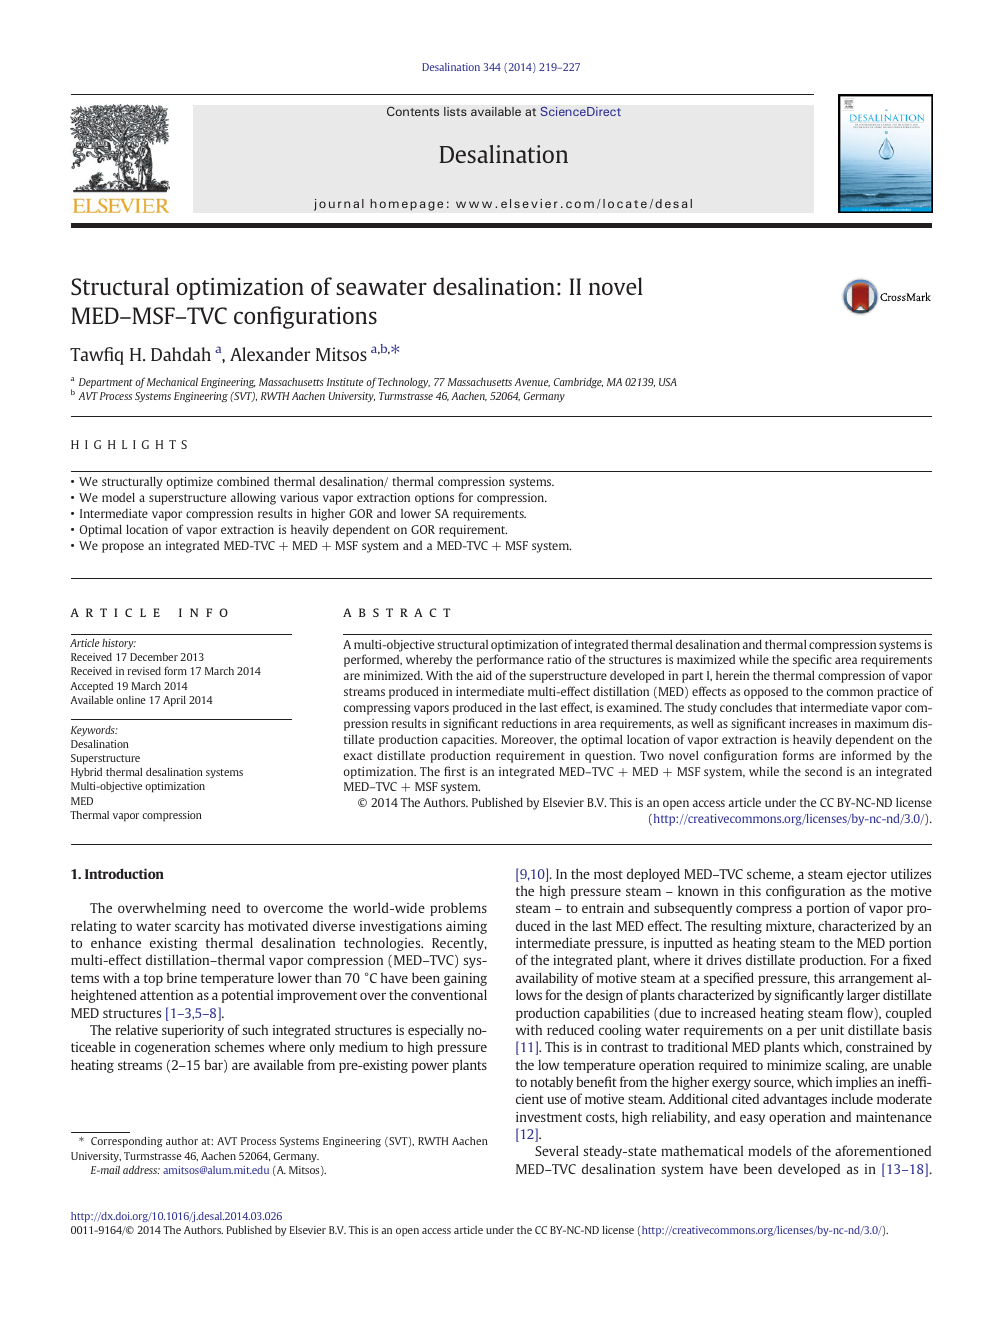 Structural optimization of seawater desalination: II novel